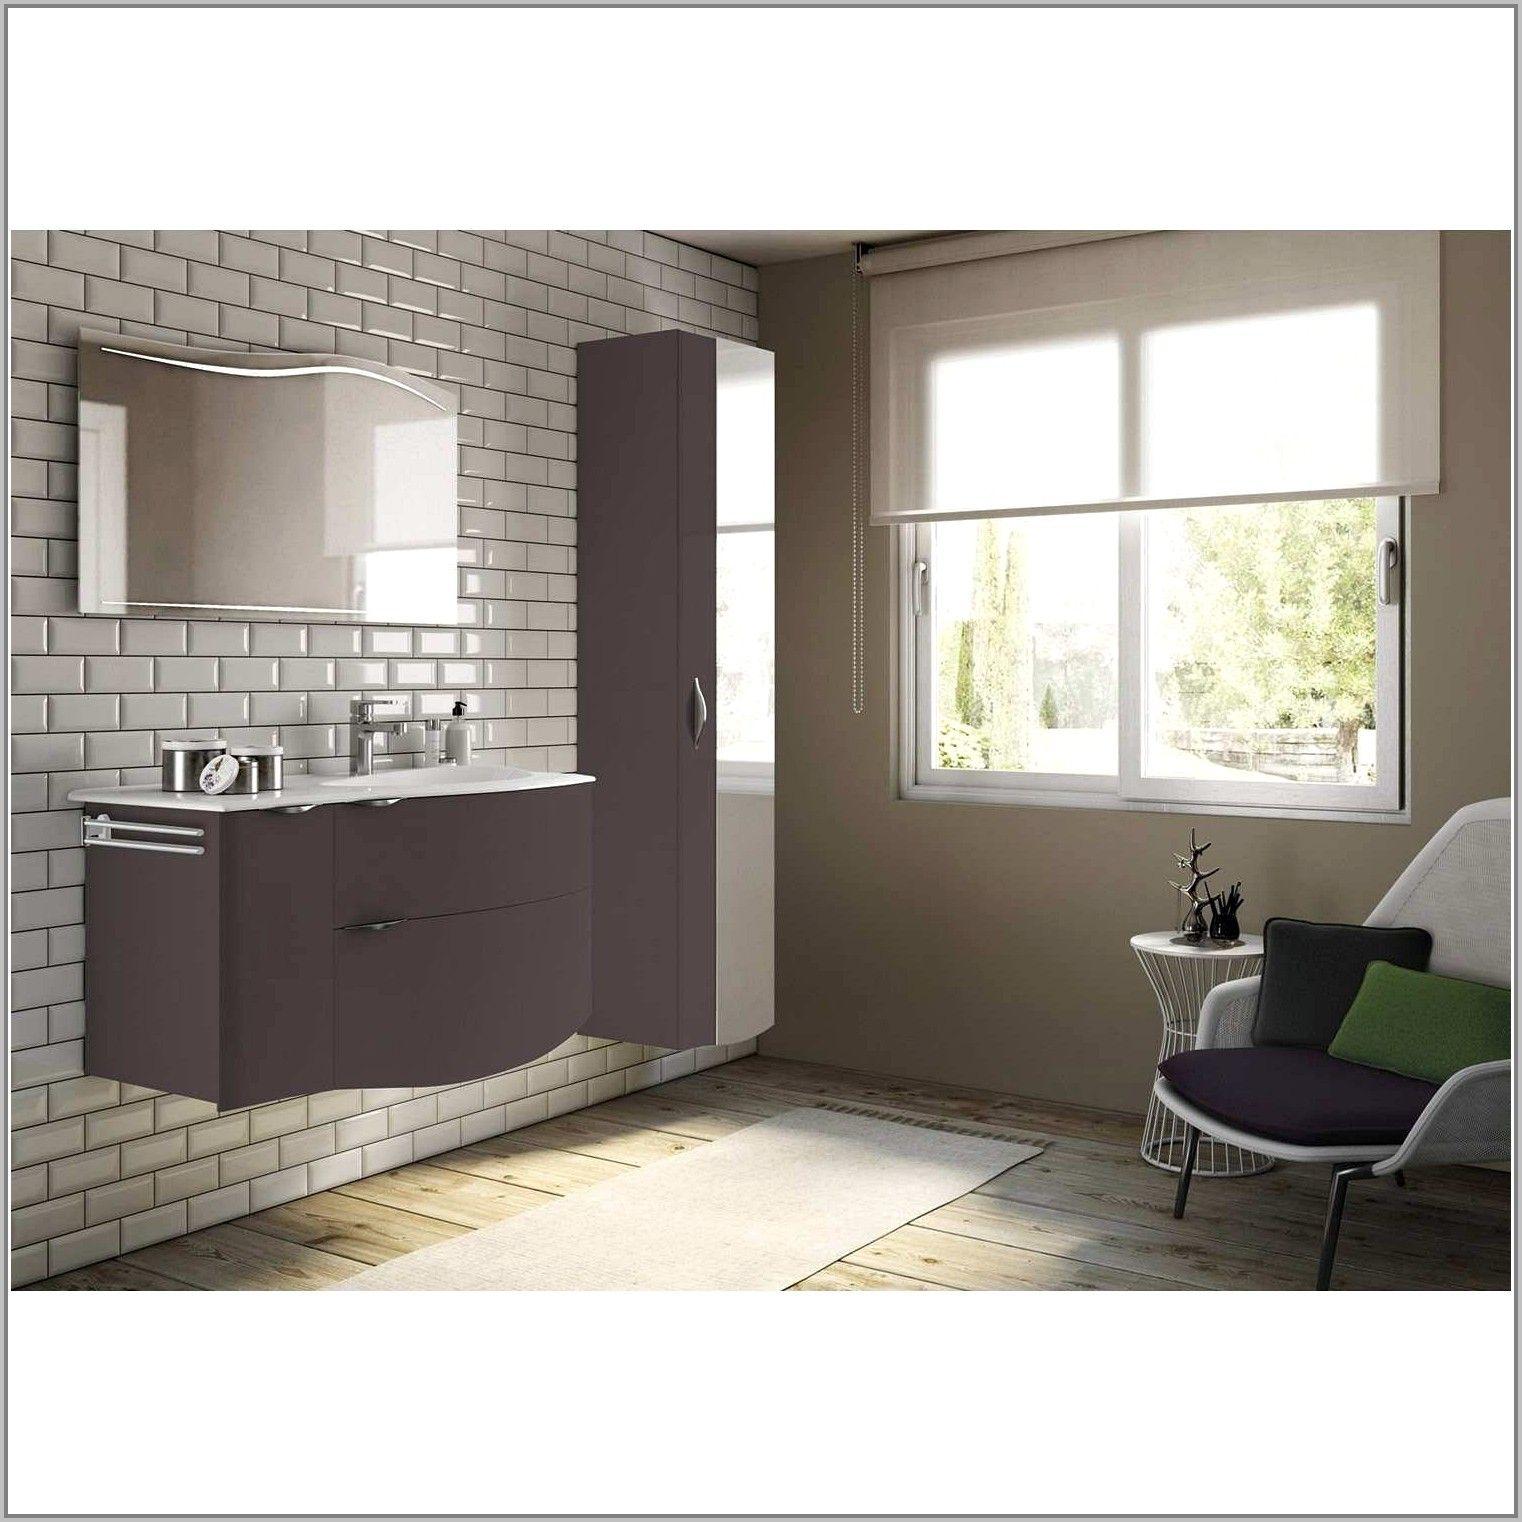 Idees Salle De Bain Leroy Merlin In 2020 Modern Bathroom Design House Design Design